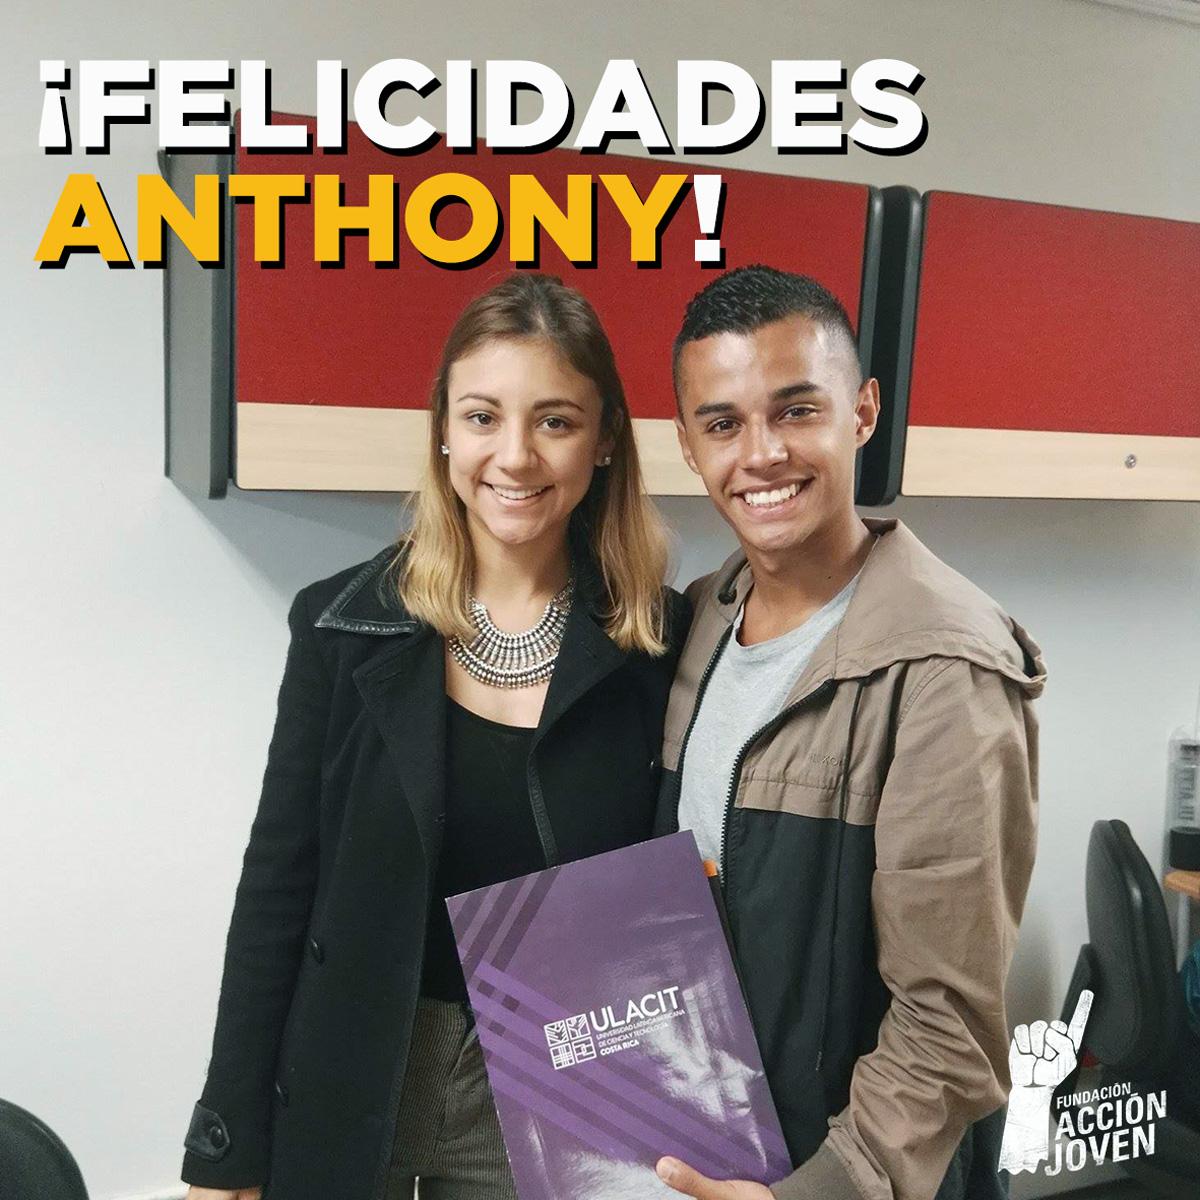 Felicidades-Anthony.jpg